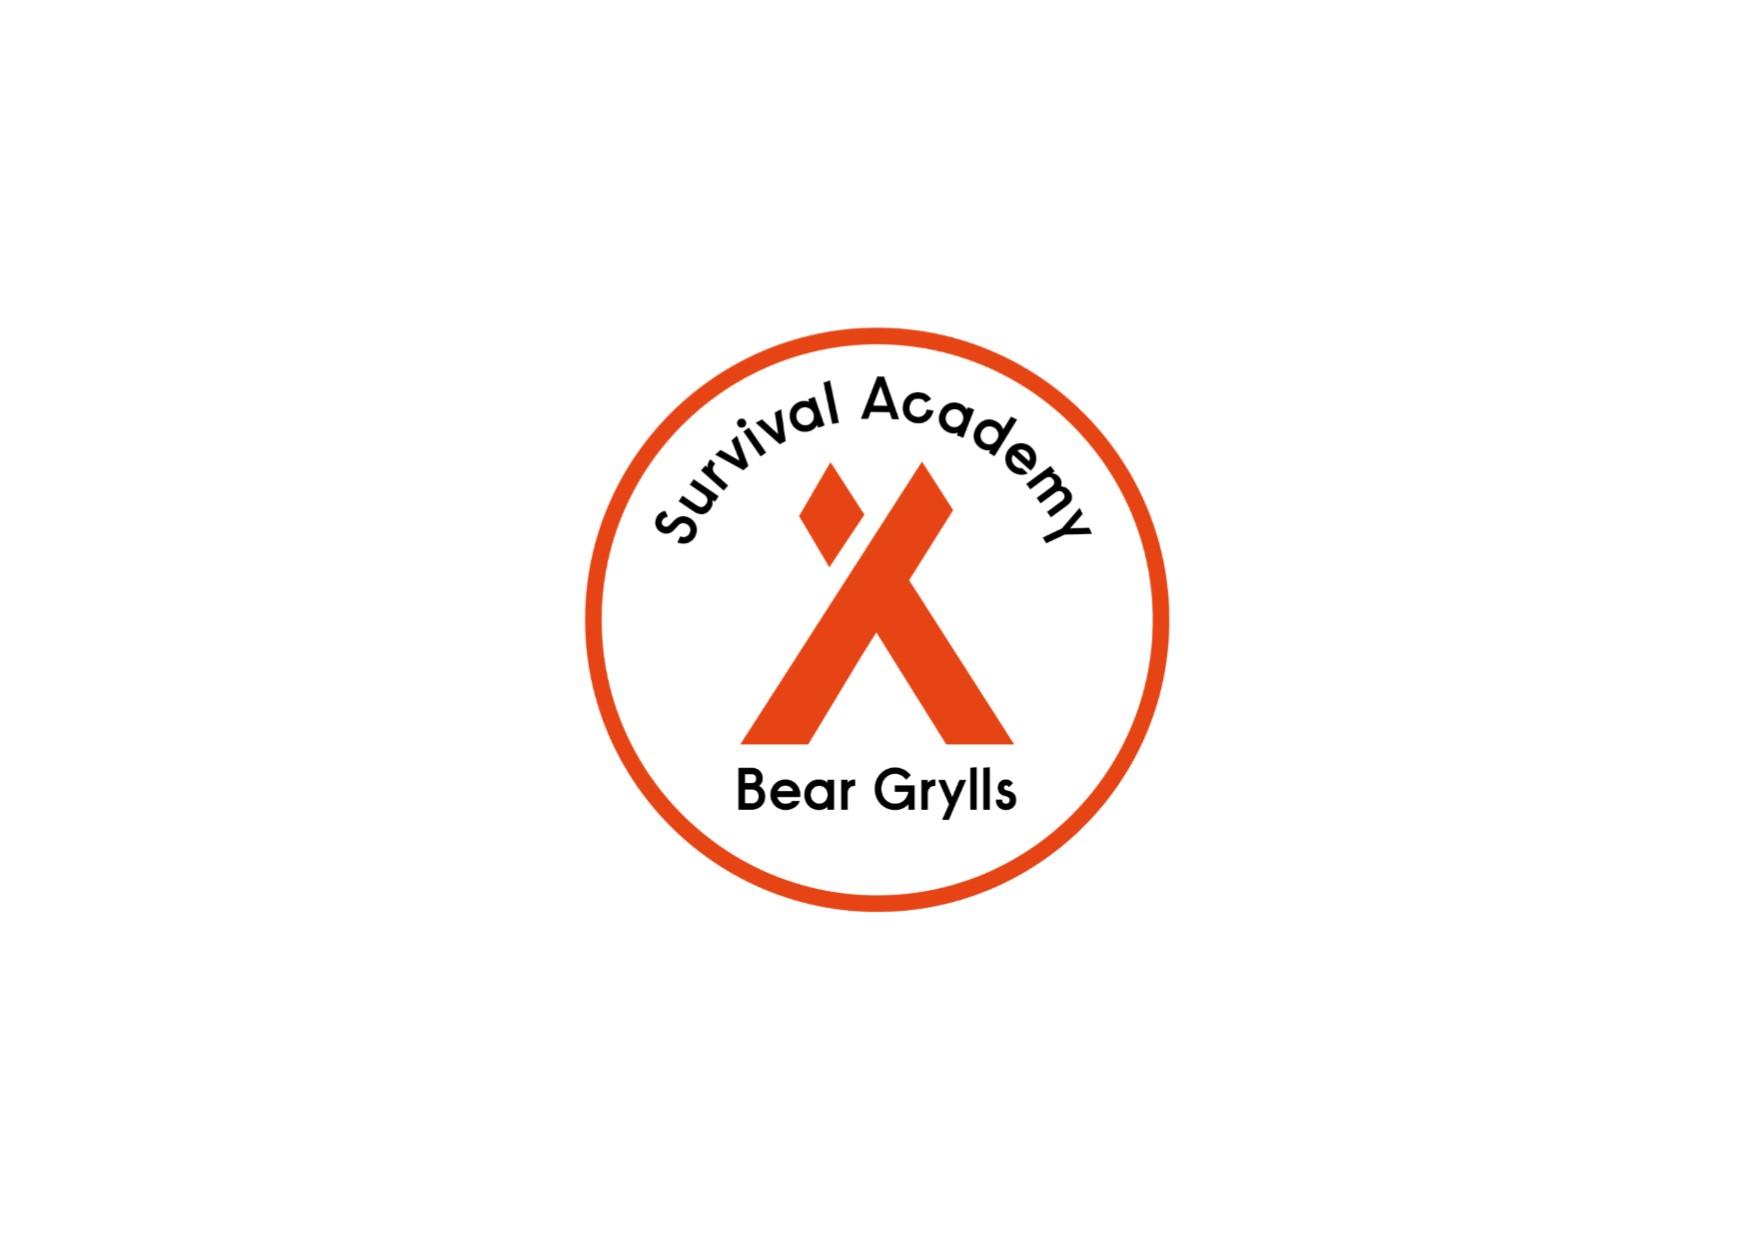 Read Bear Grylls Survival Academy Reviews